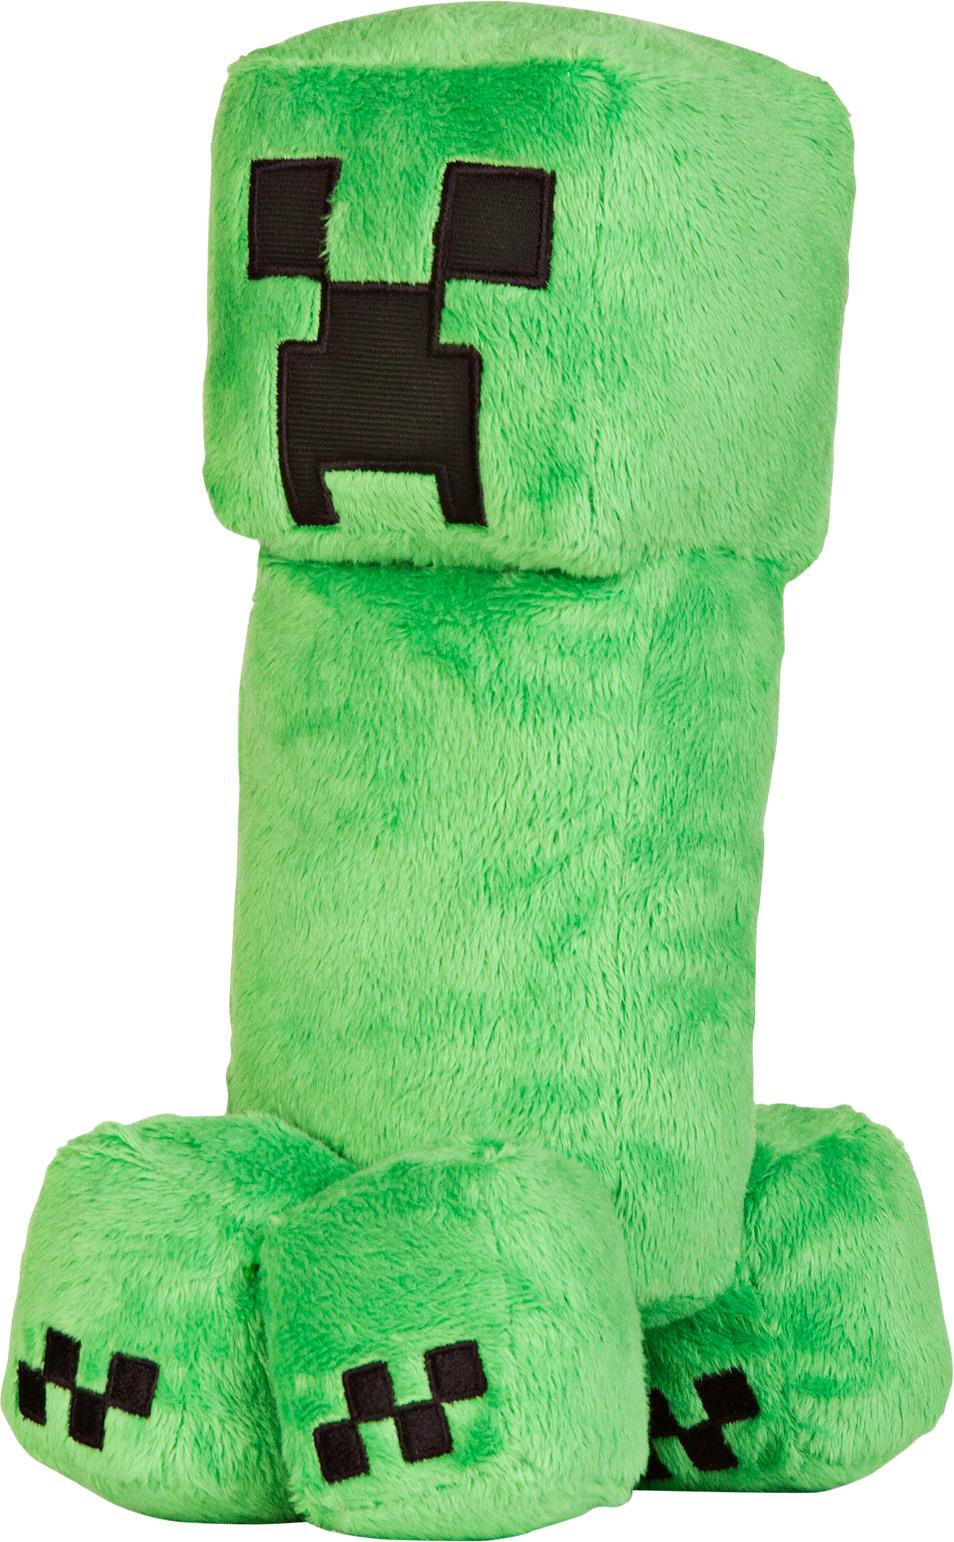 Minecraft 10.5-Inch Creeper Plush